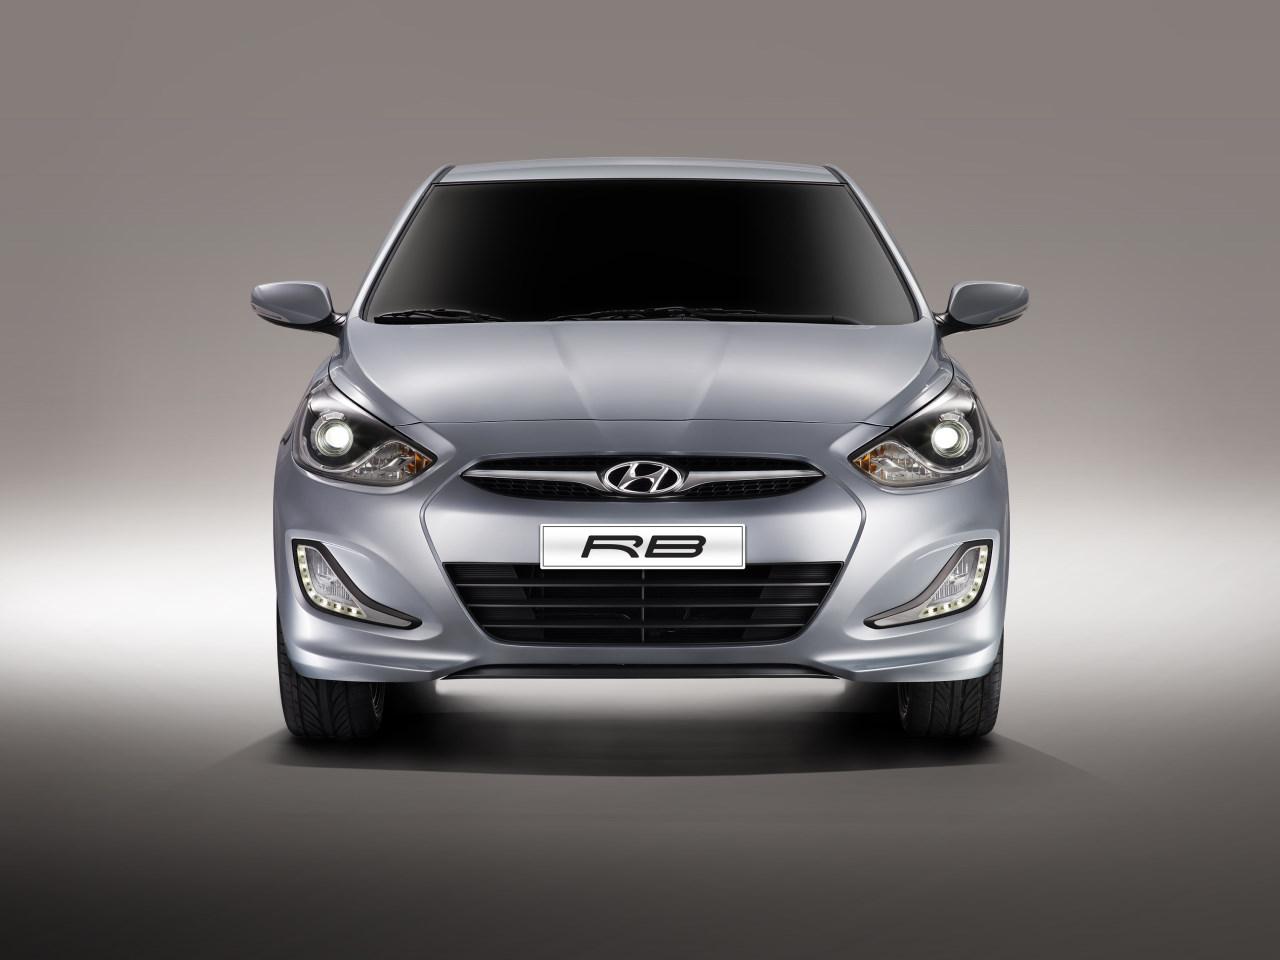 2010 Hyundai Rb Concepts Trajet Wiring Diagram